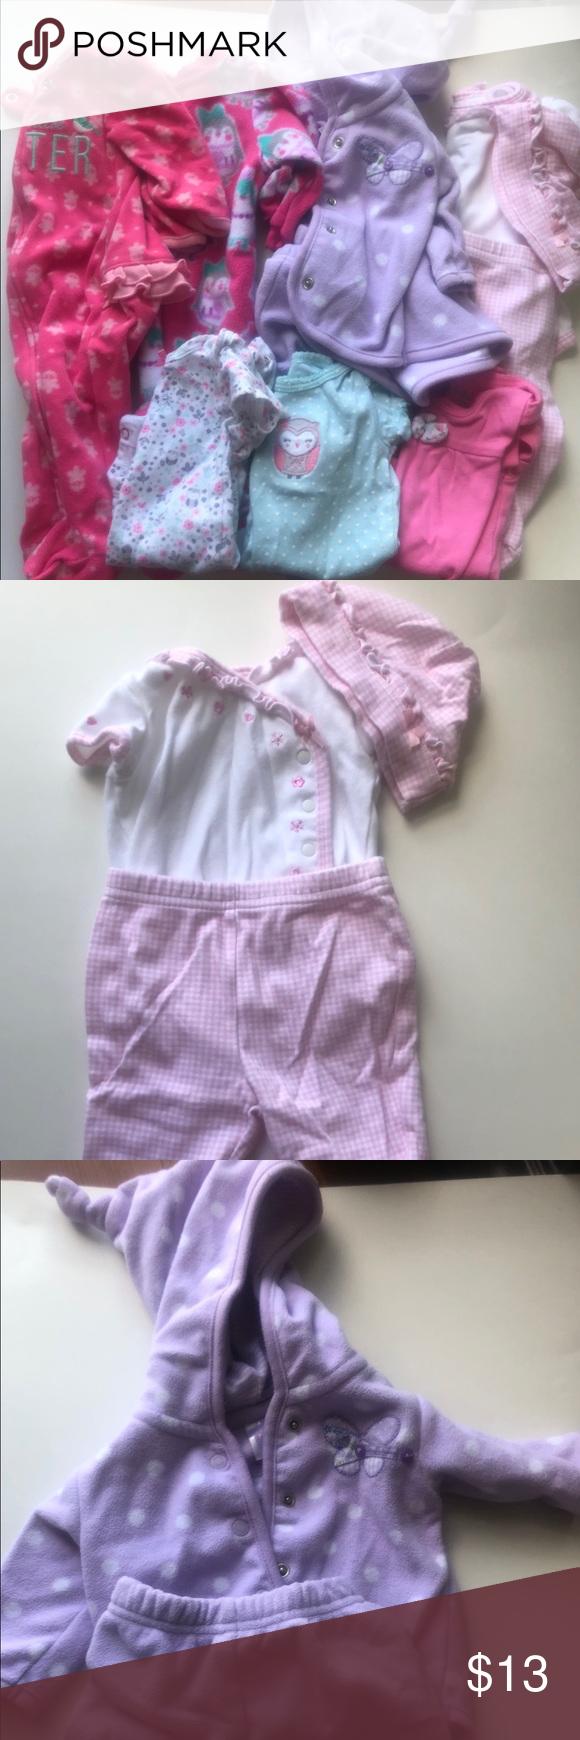 0092832ca Newborn Baby girl bundle Sleepers